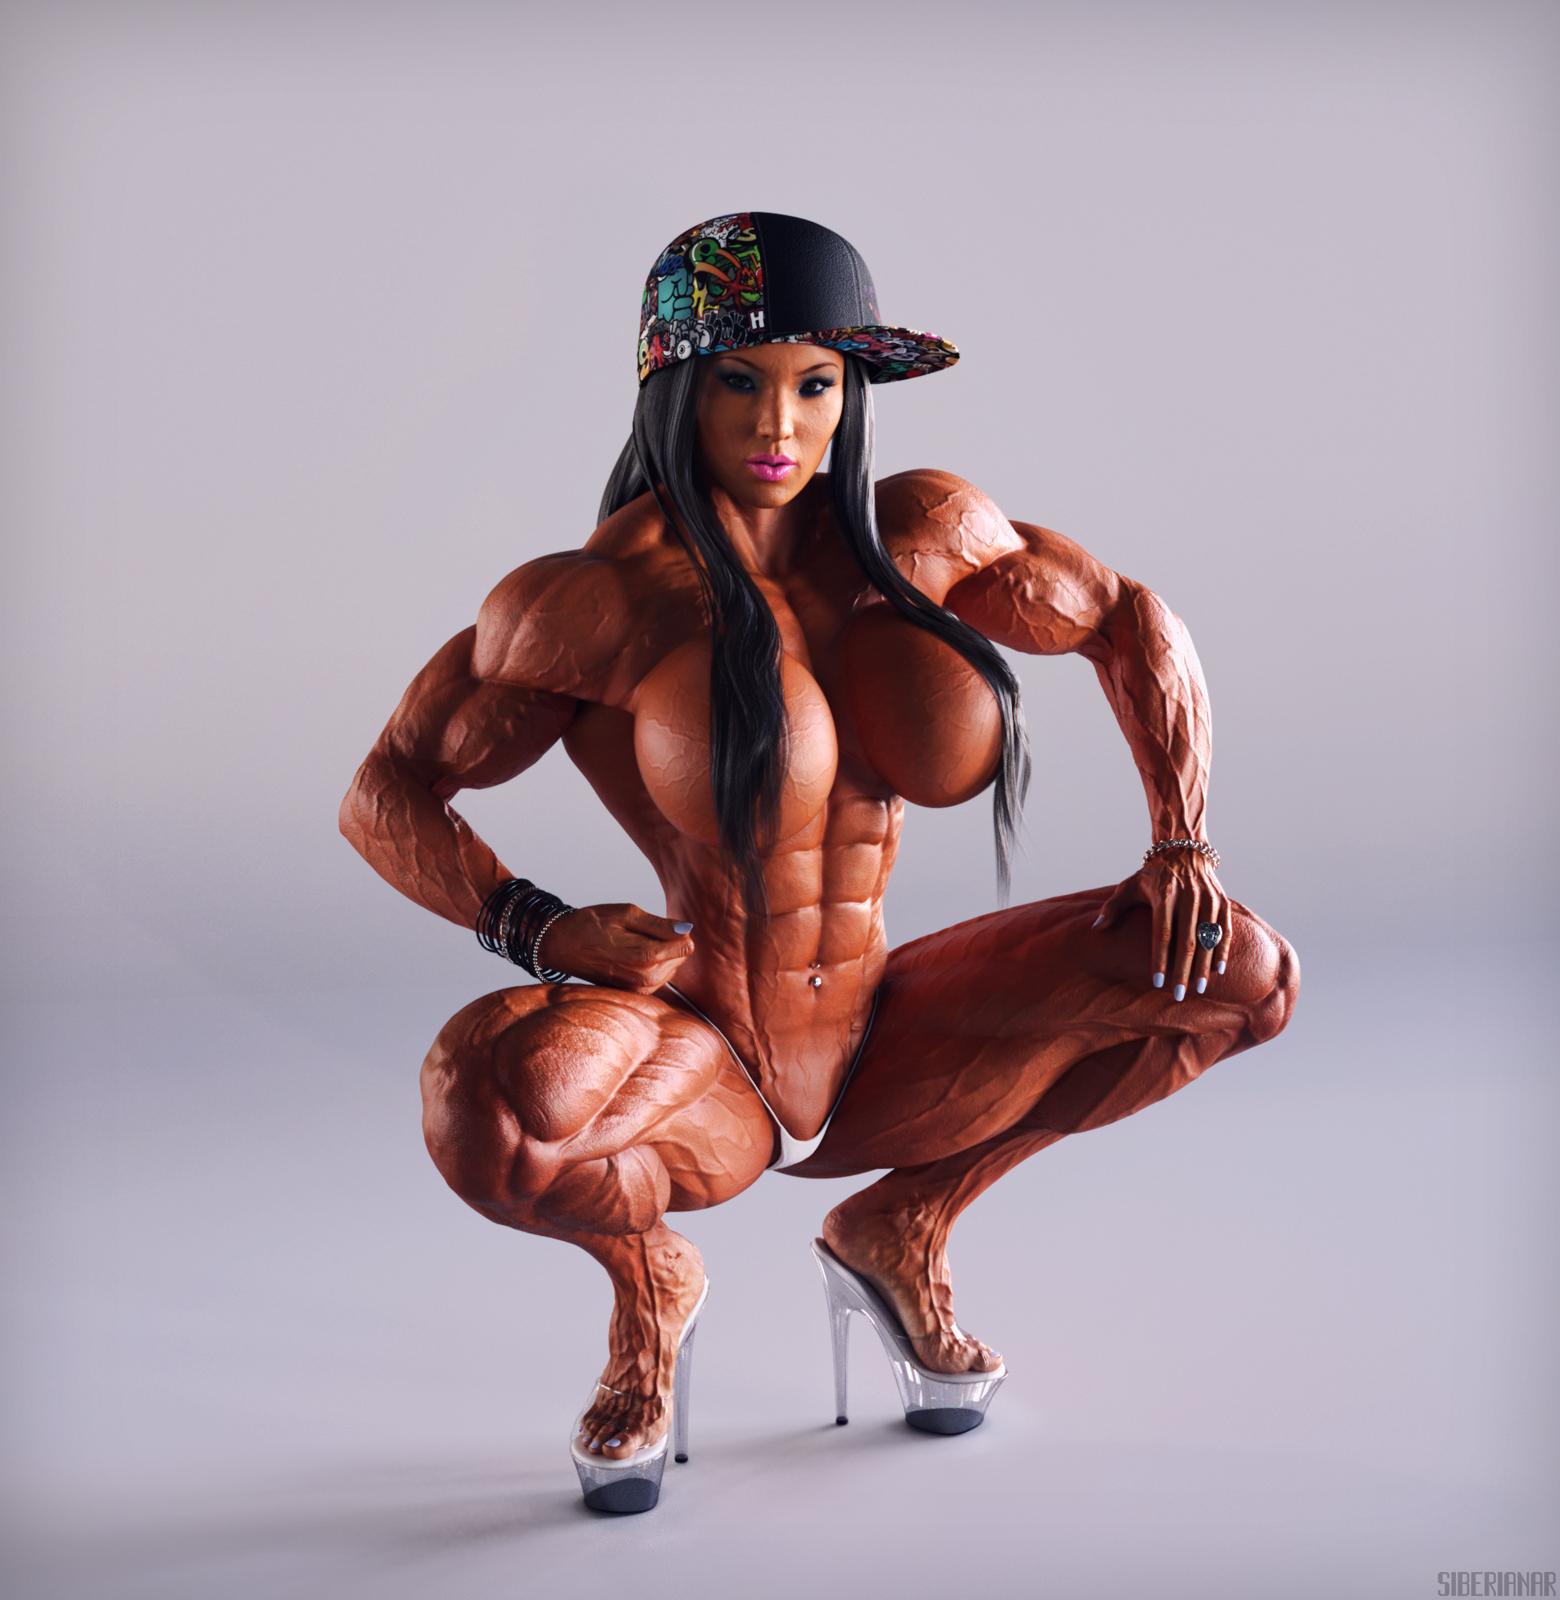 Bodybuilding women s e x pic erotic pics